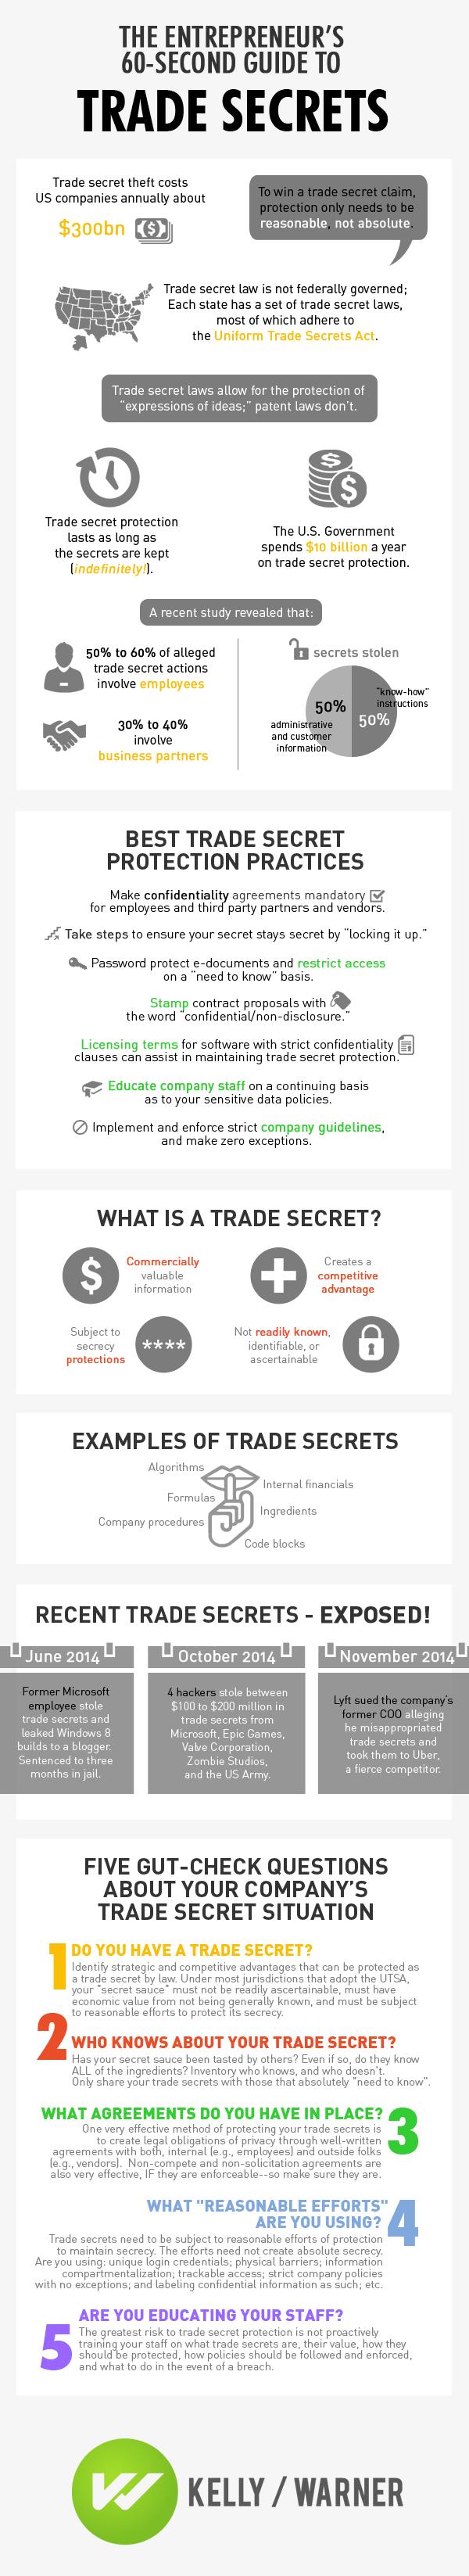 Trade Secret Infographic